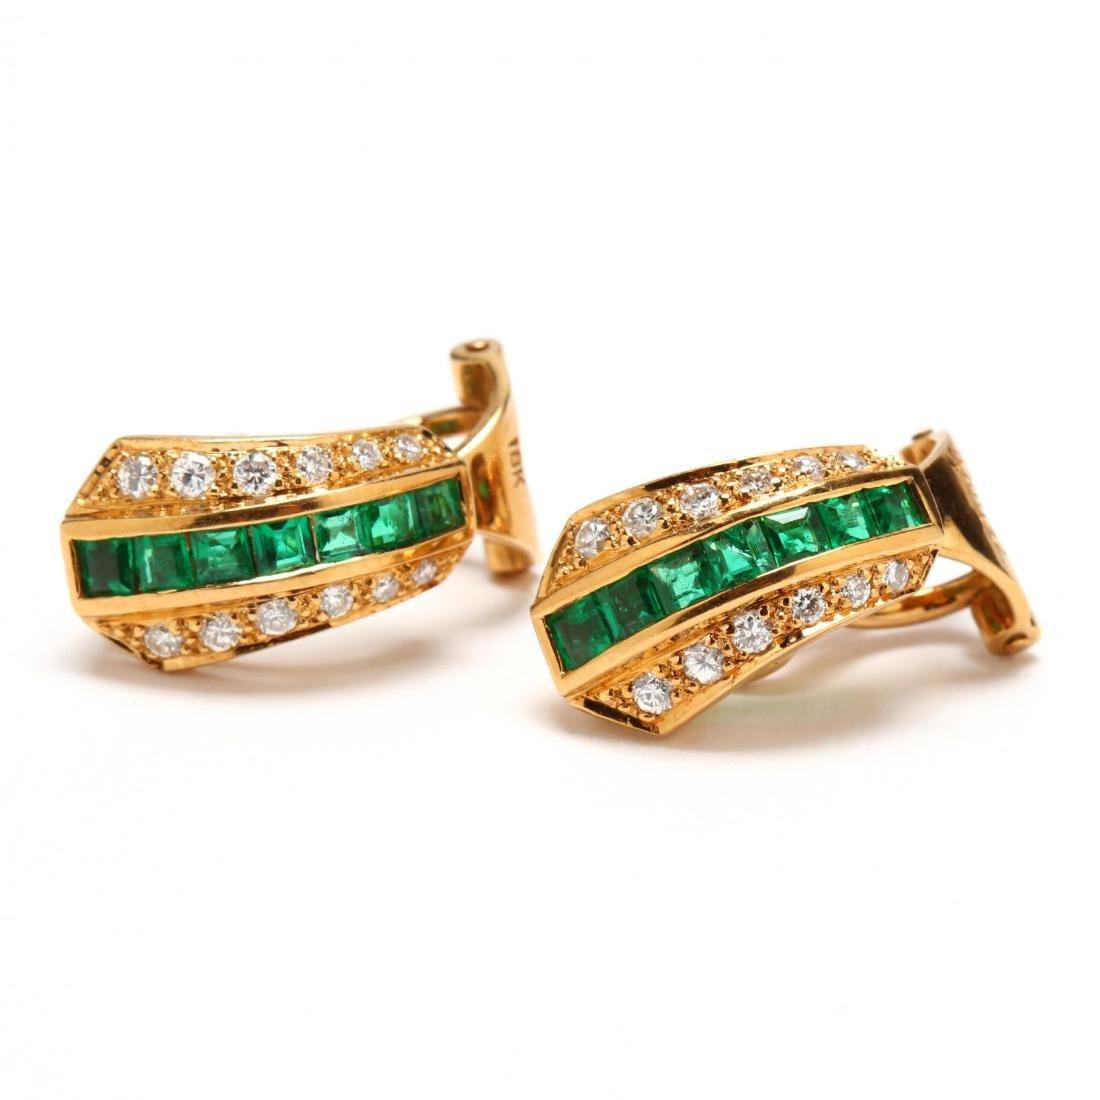 18KT Diamond and Emerald Earrings